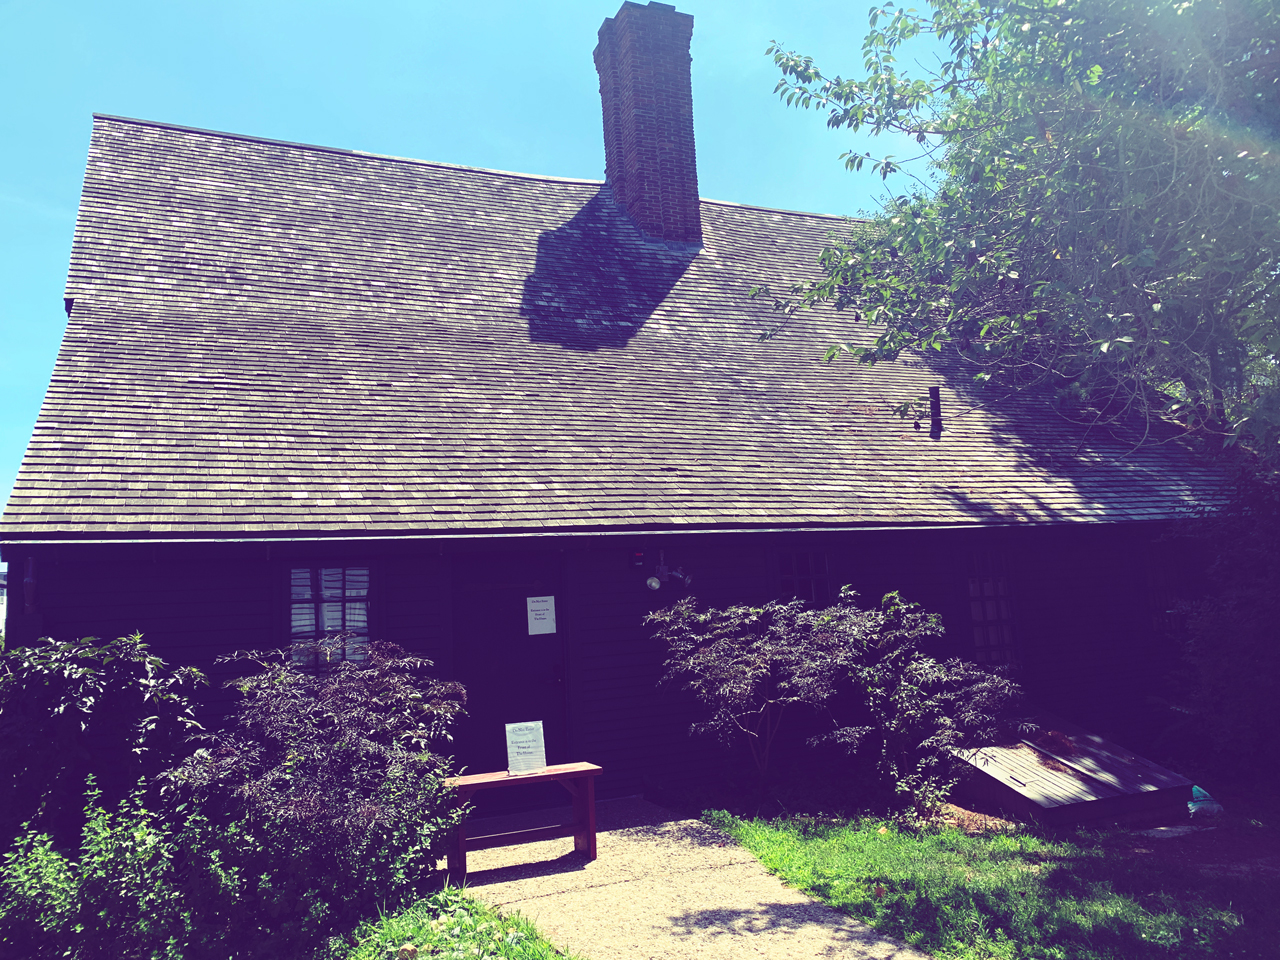 witch-house-salem-massachusetts-1280x960-06